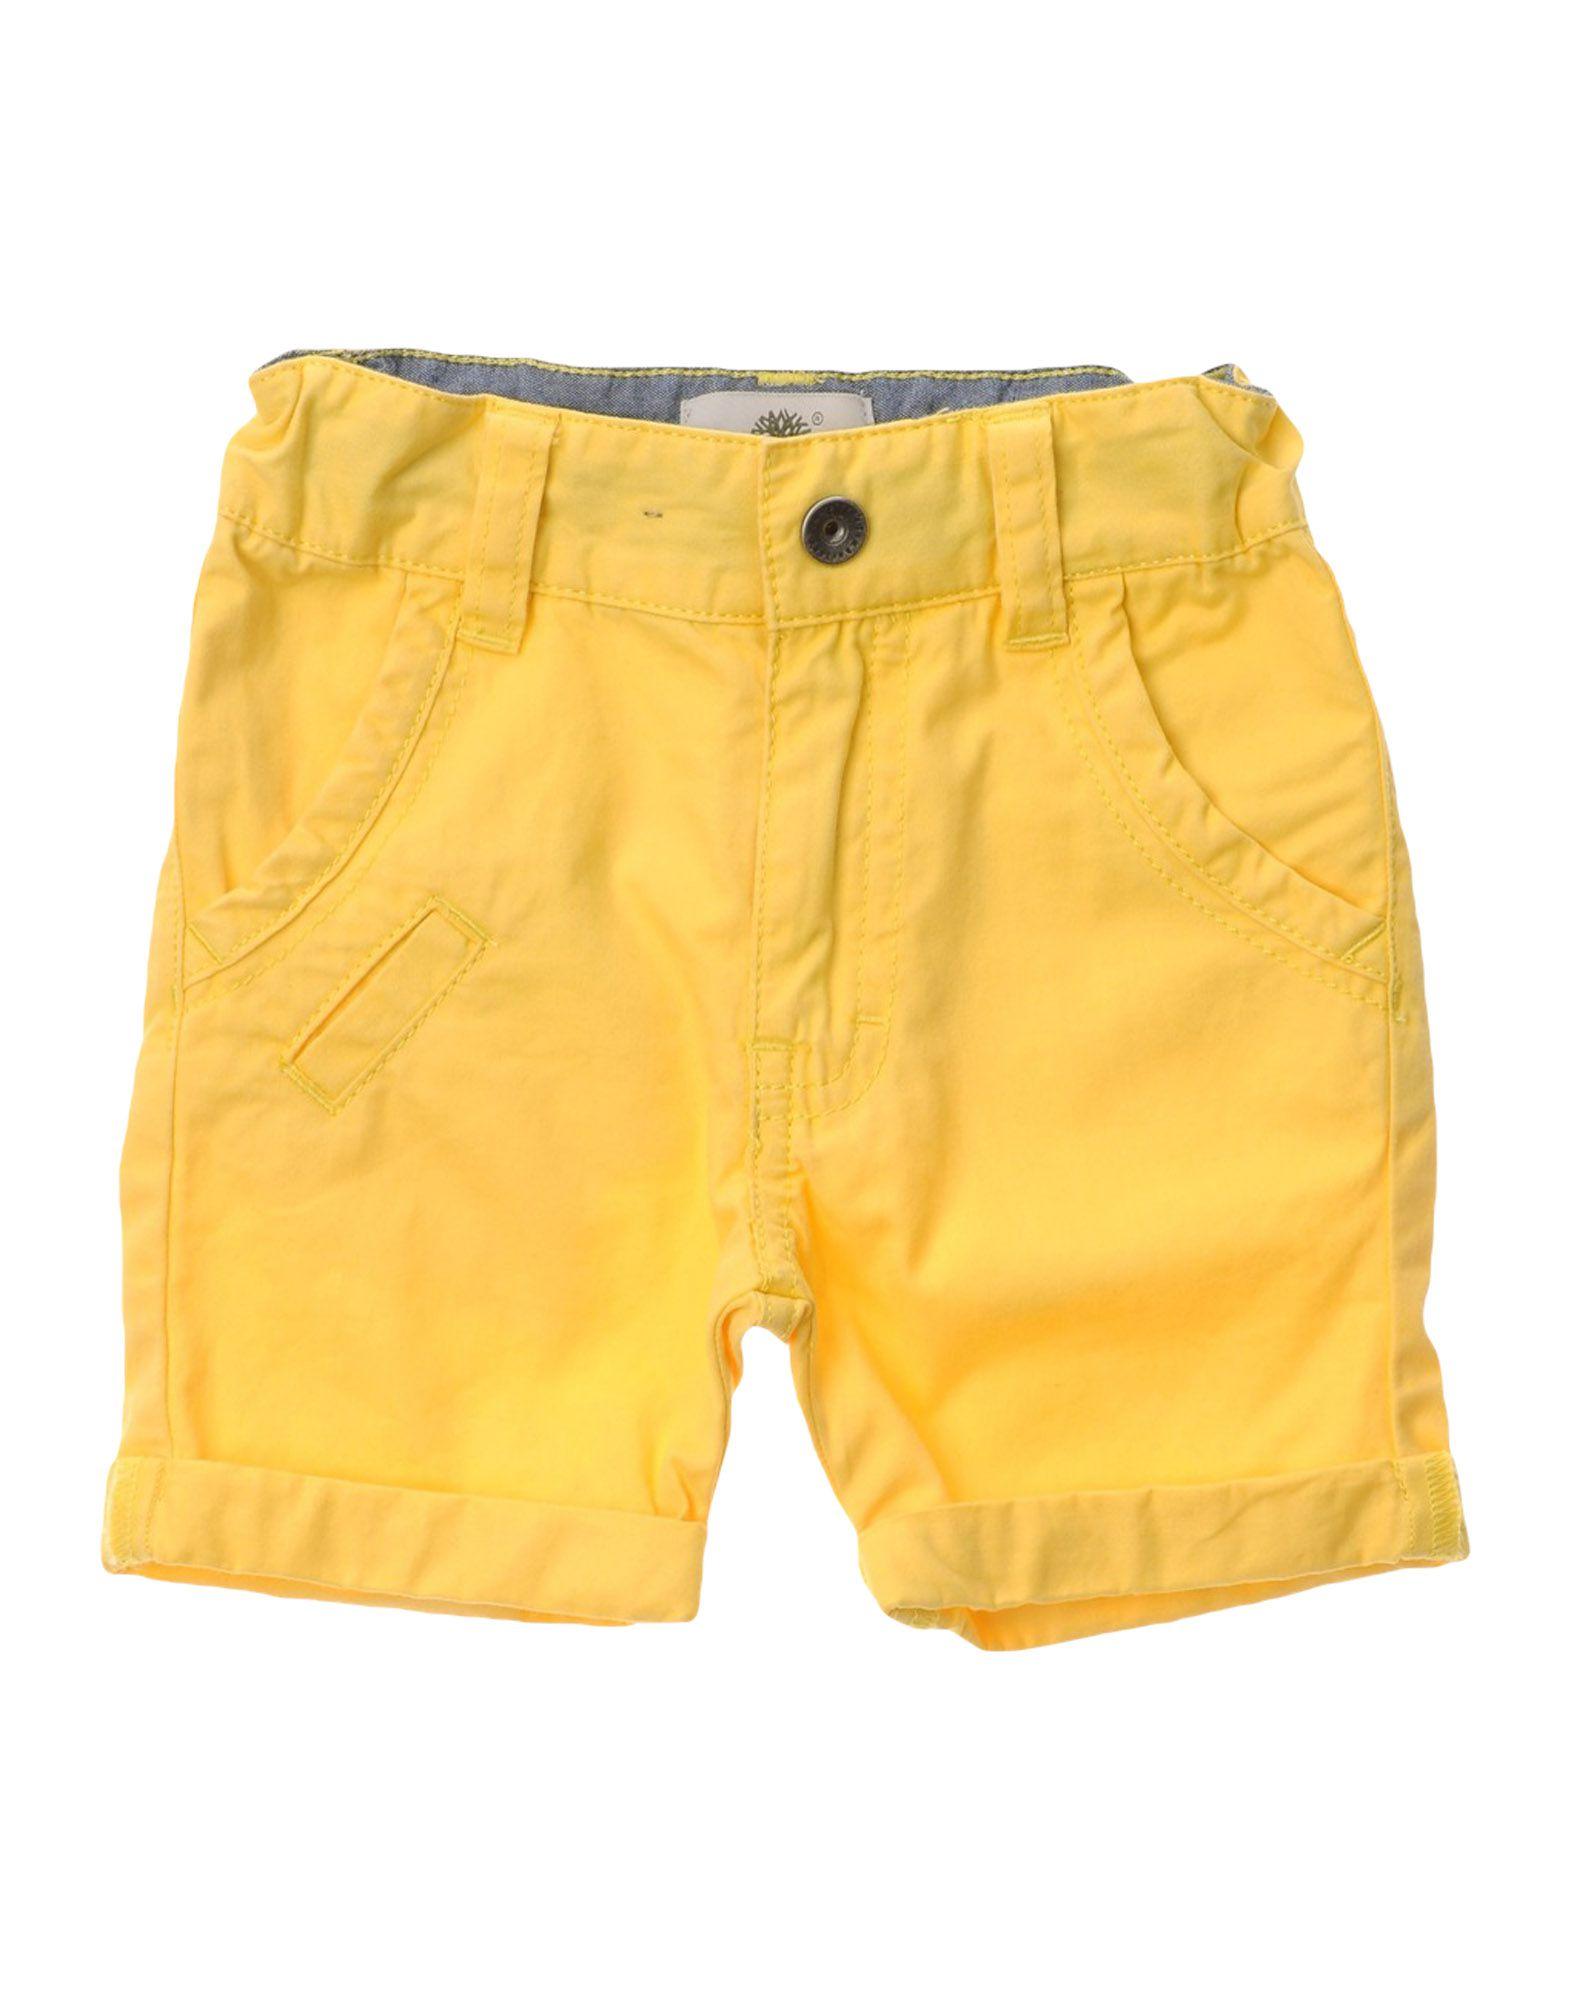 1526c712 Timberland Shorts & Bermuda Boy 0-24 months online on YOOX Bulgaria